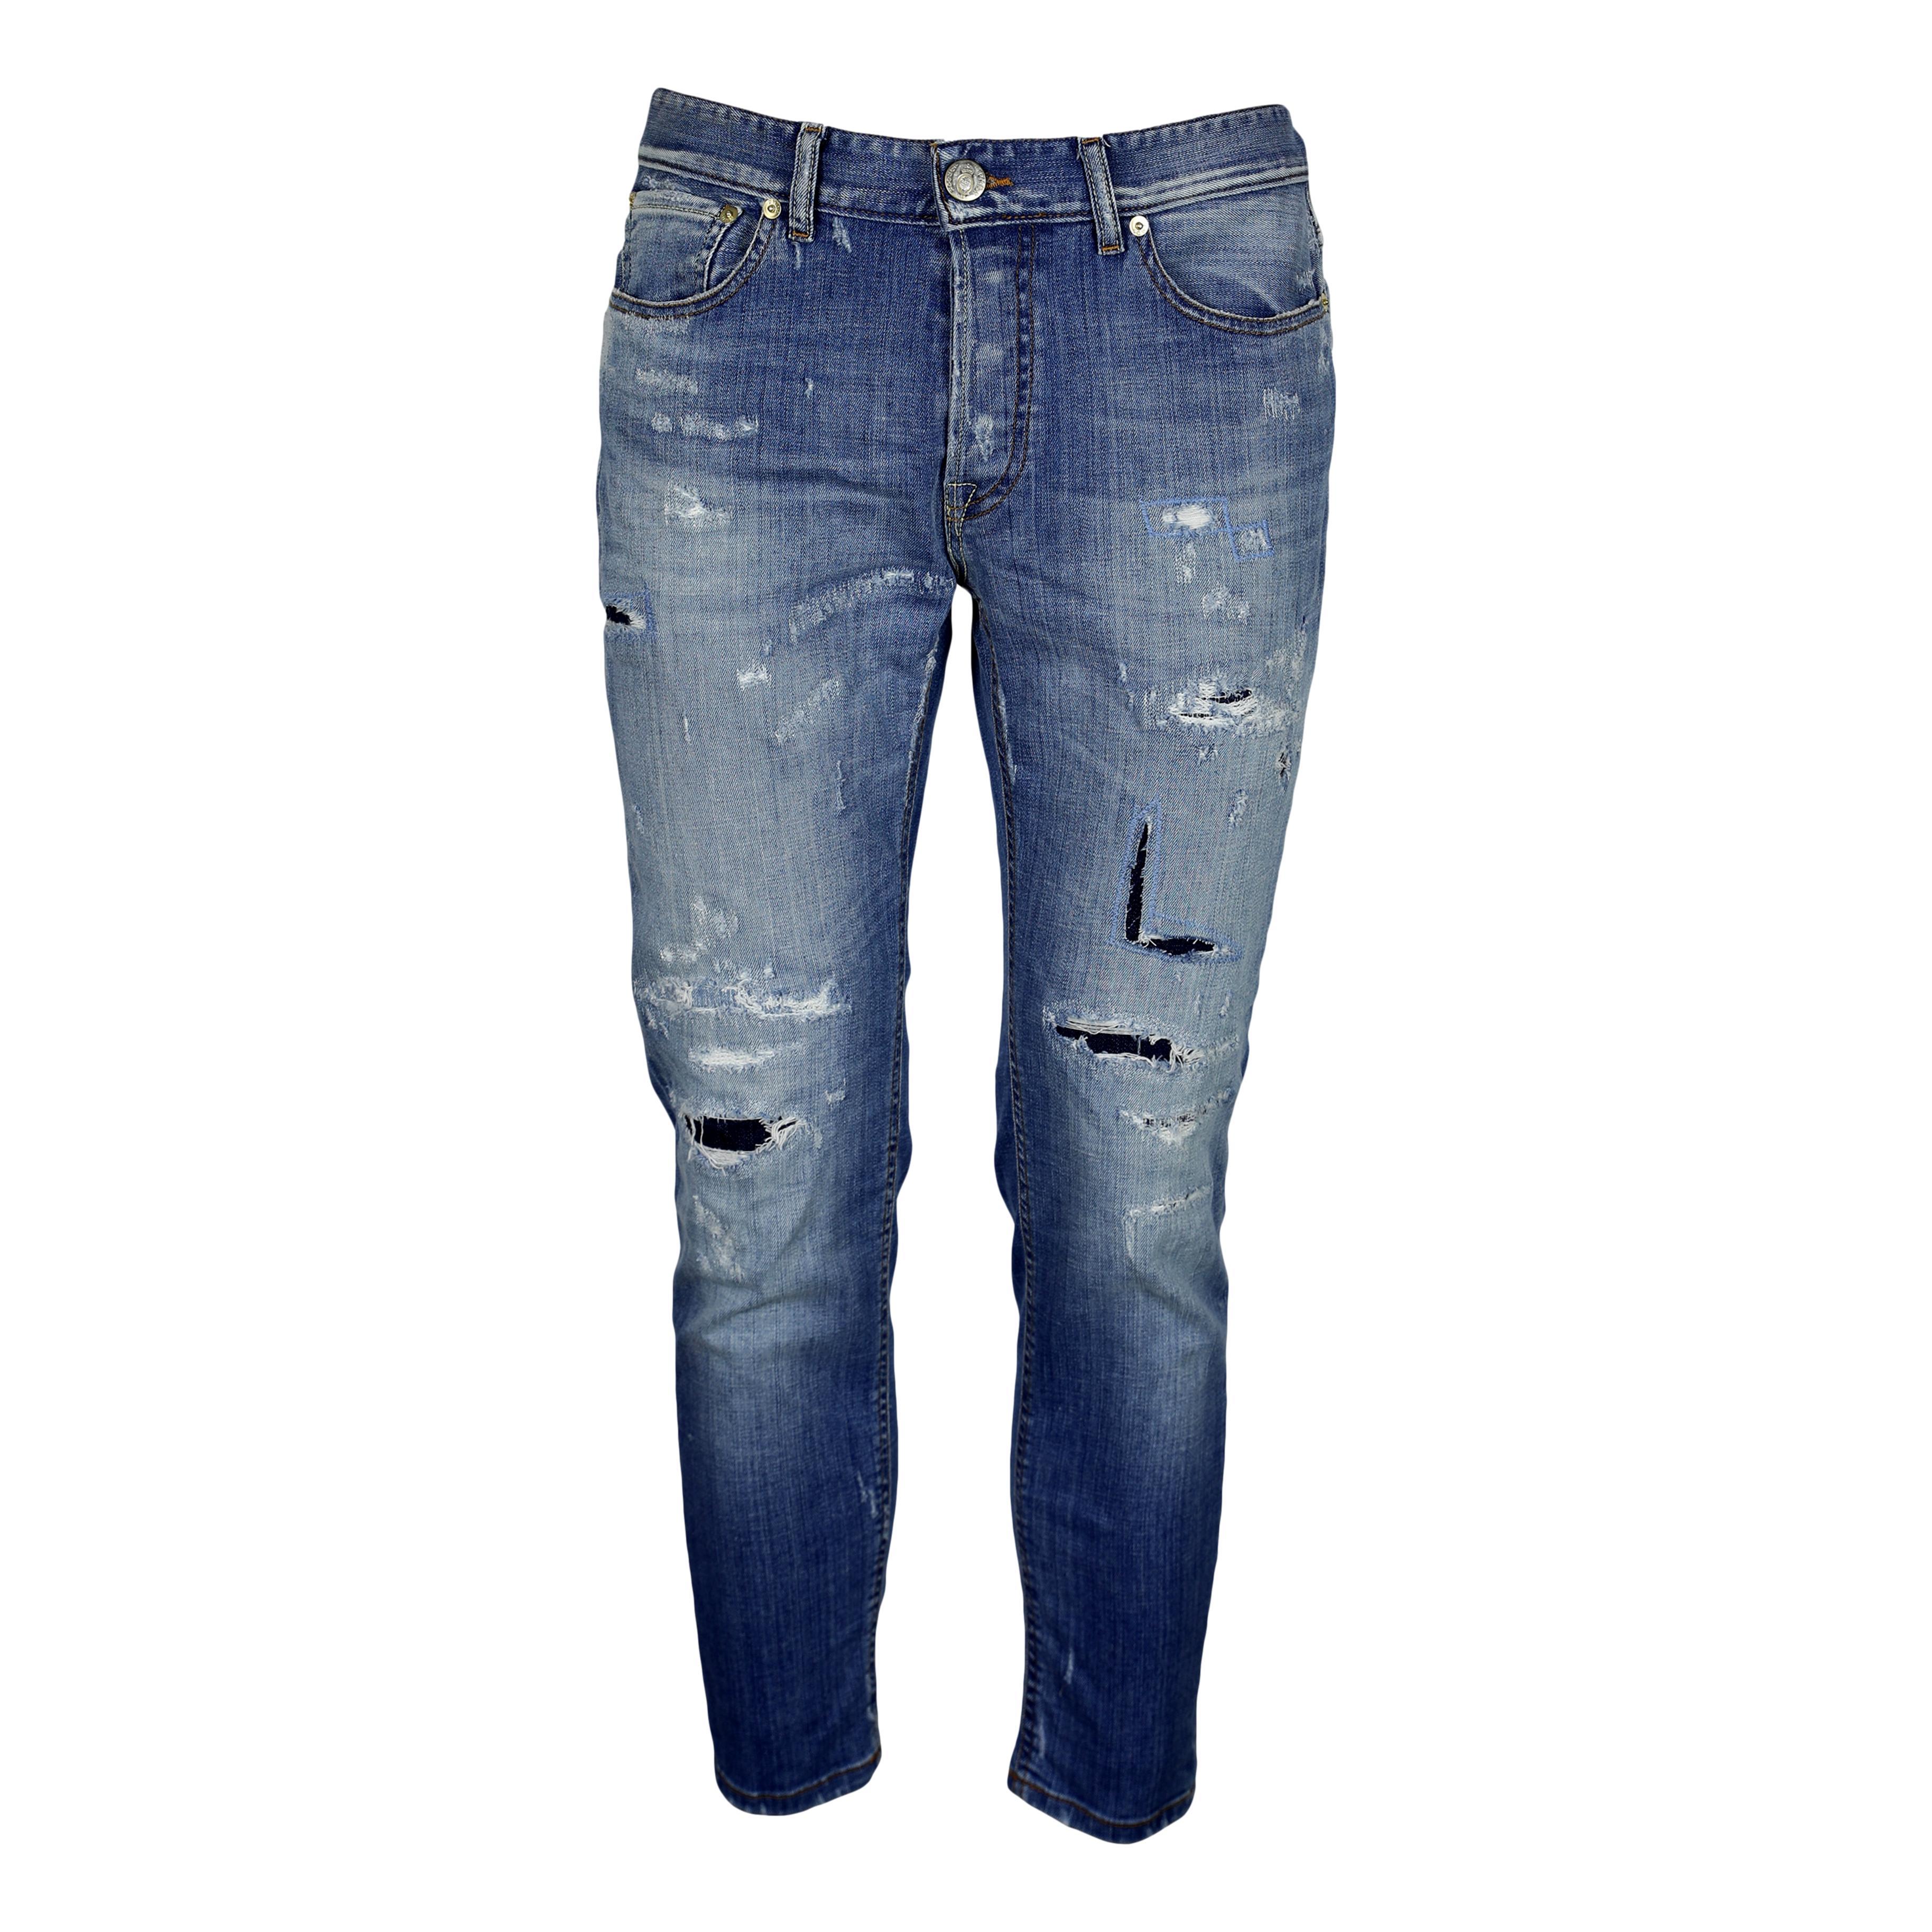 GERARD JEANS PMDS | Jeans | S2104179 27EV27EV